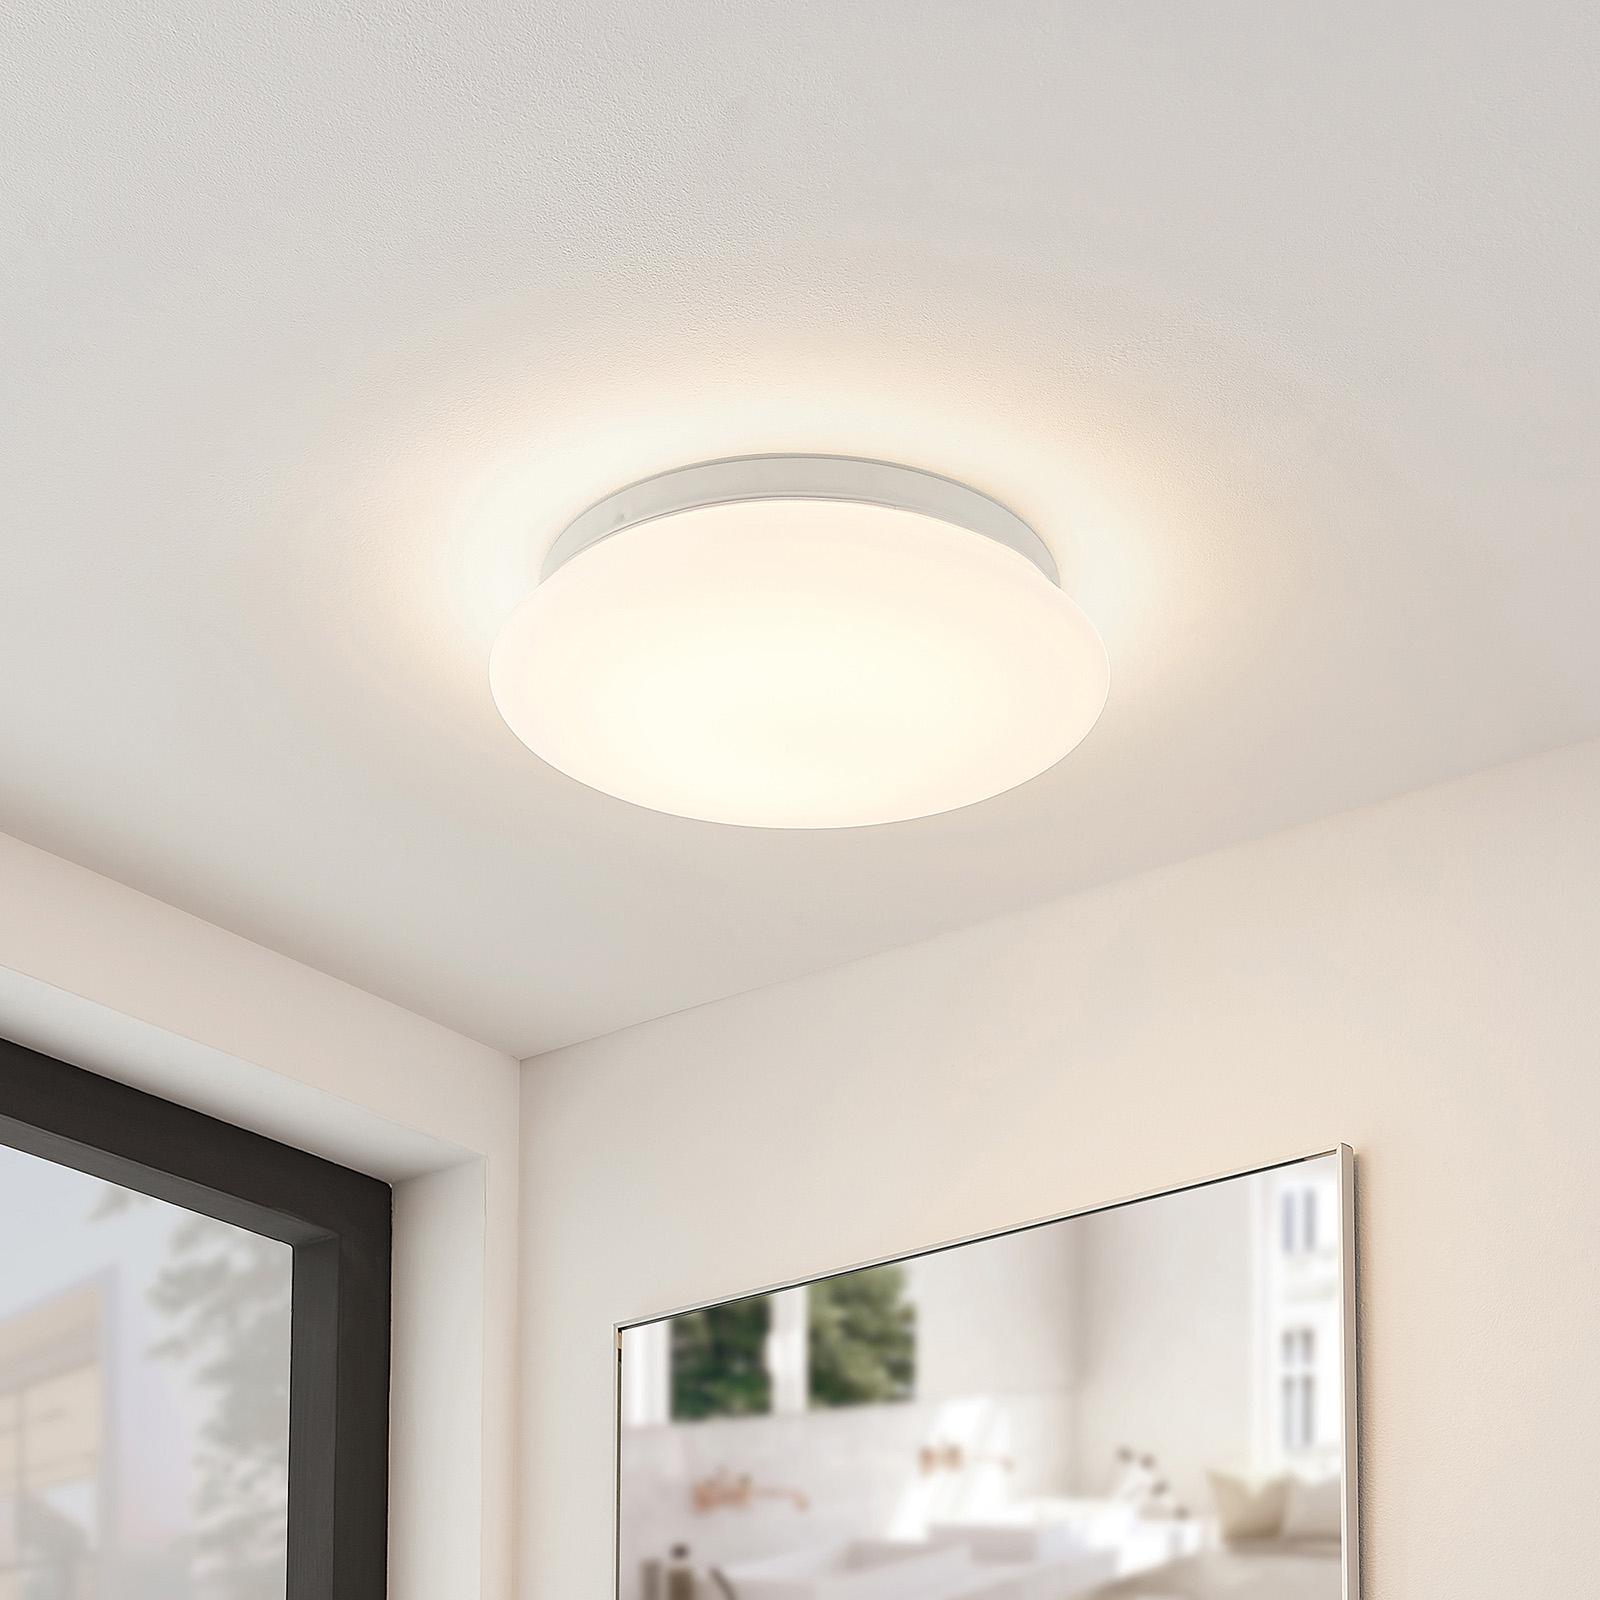 Arcchio Solomia LED-Deckenlampe, 3.000 K